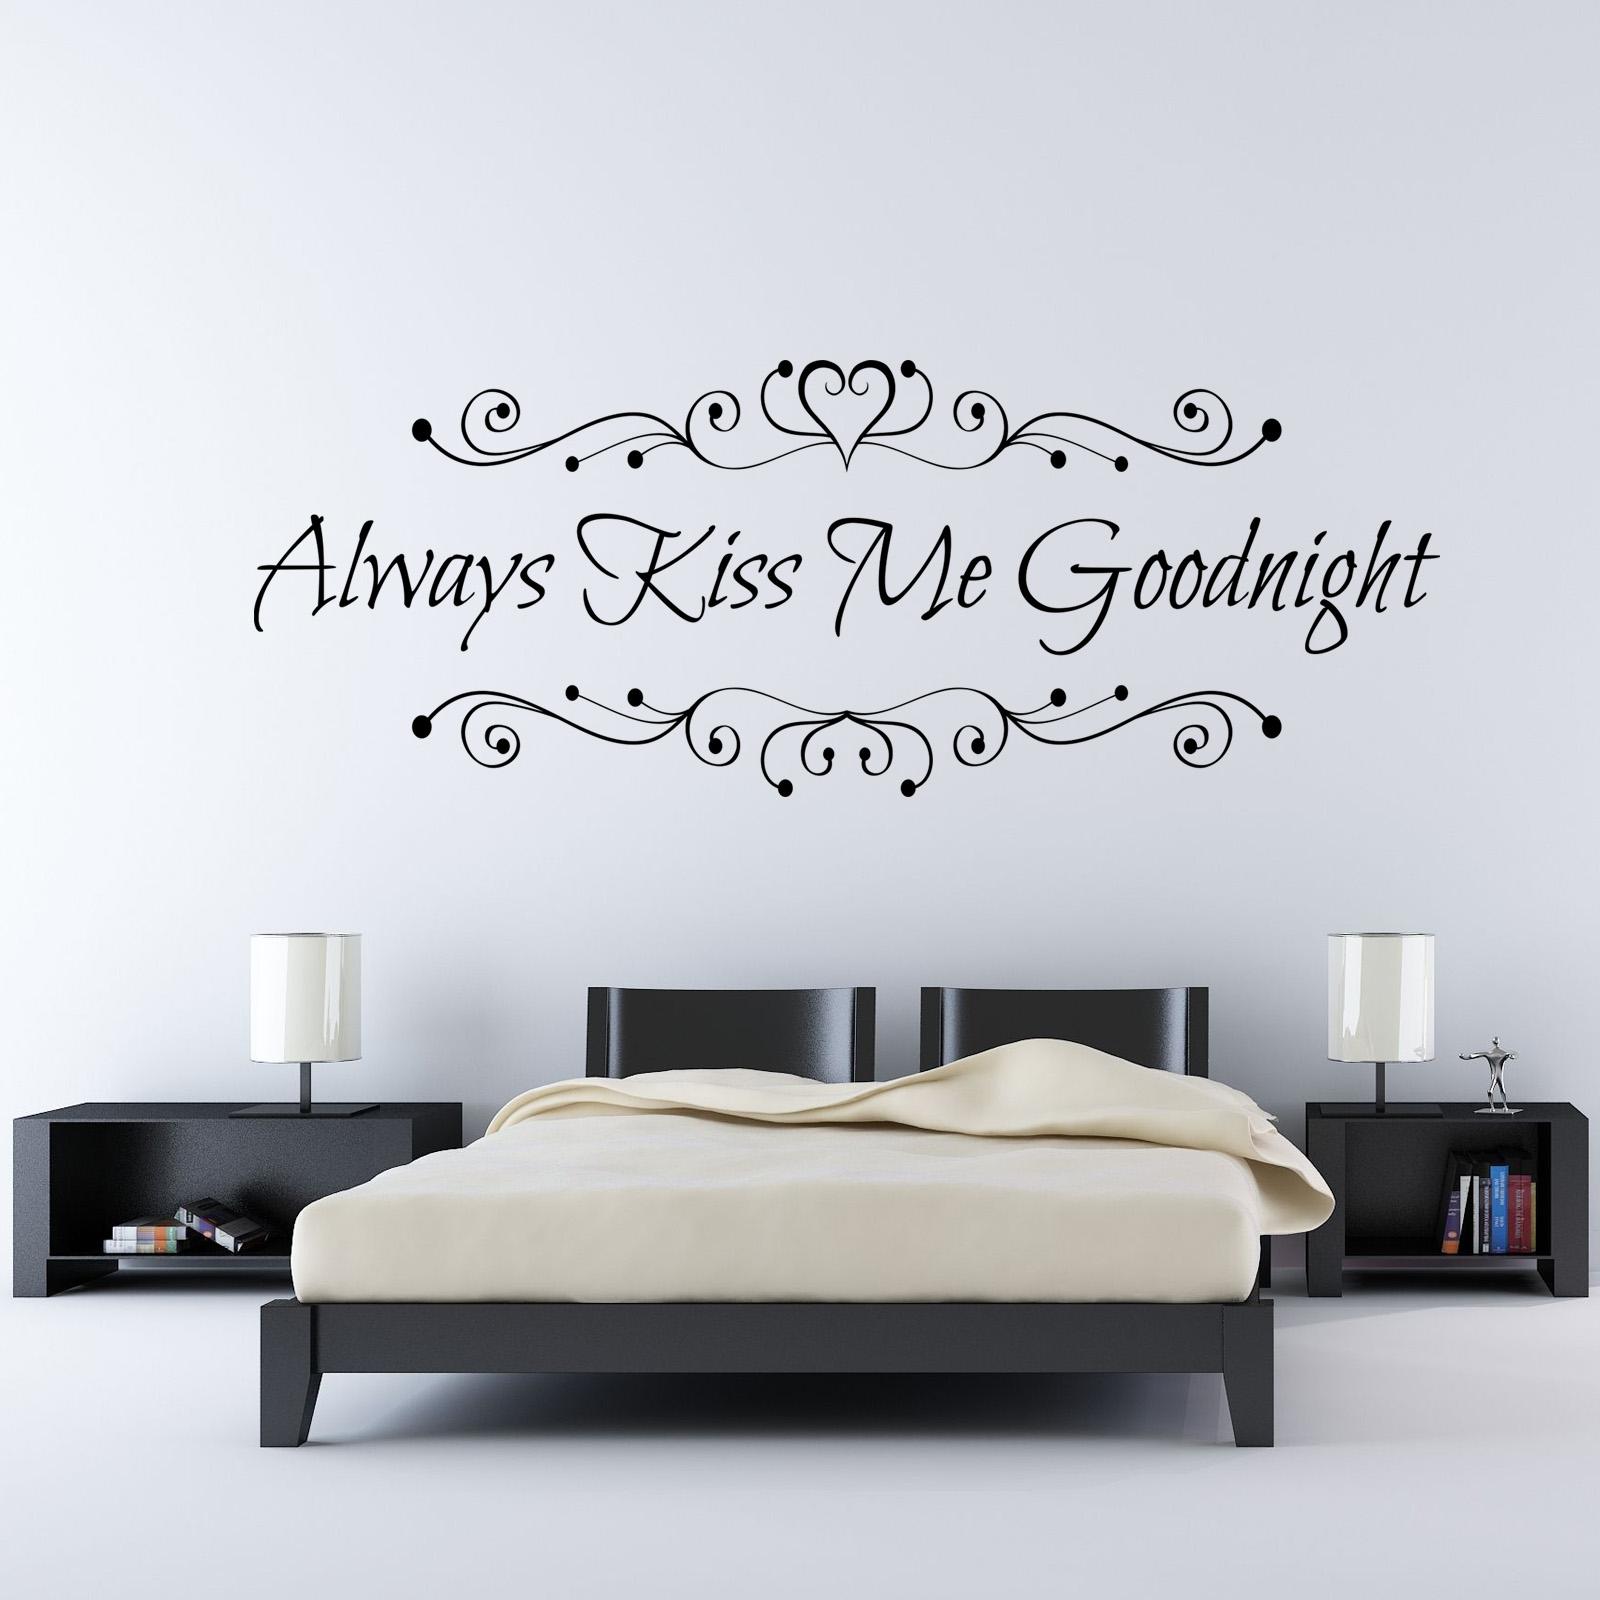 Always Kiss Me Goodnight Bedroom Vinyl Wall Art Love Quote Sticker ...